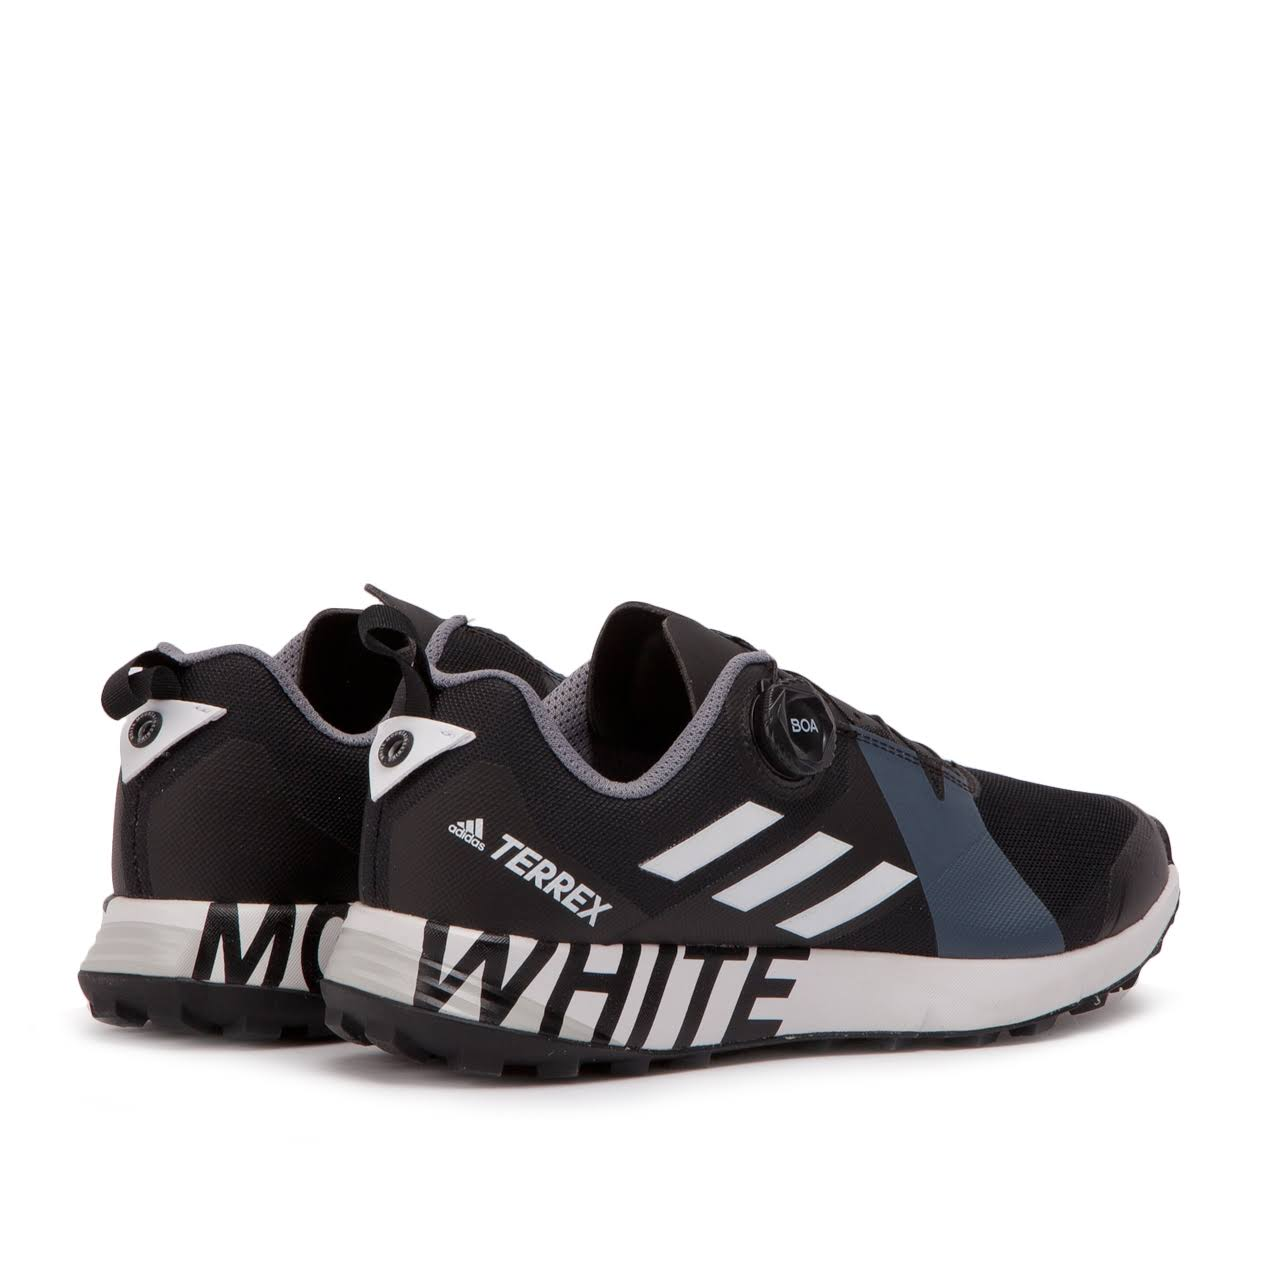 negro X Two Adidas Montañismo Blanco Terrex Boa f7ZYnwHqC